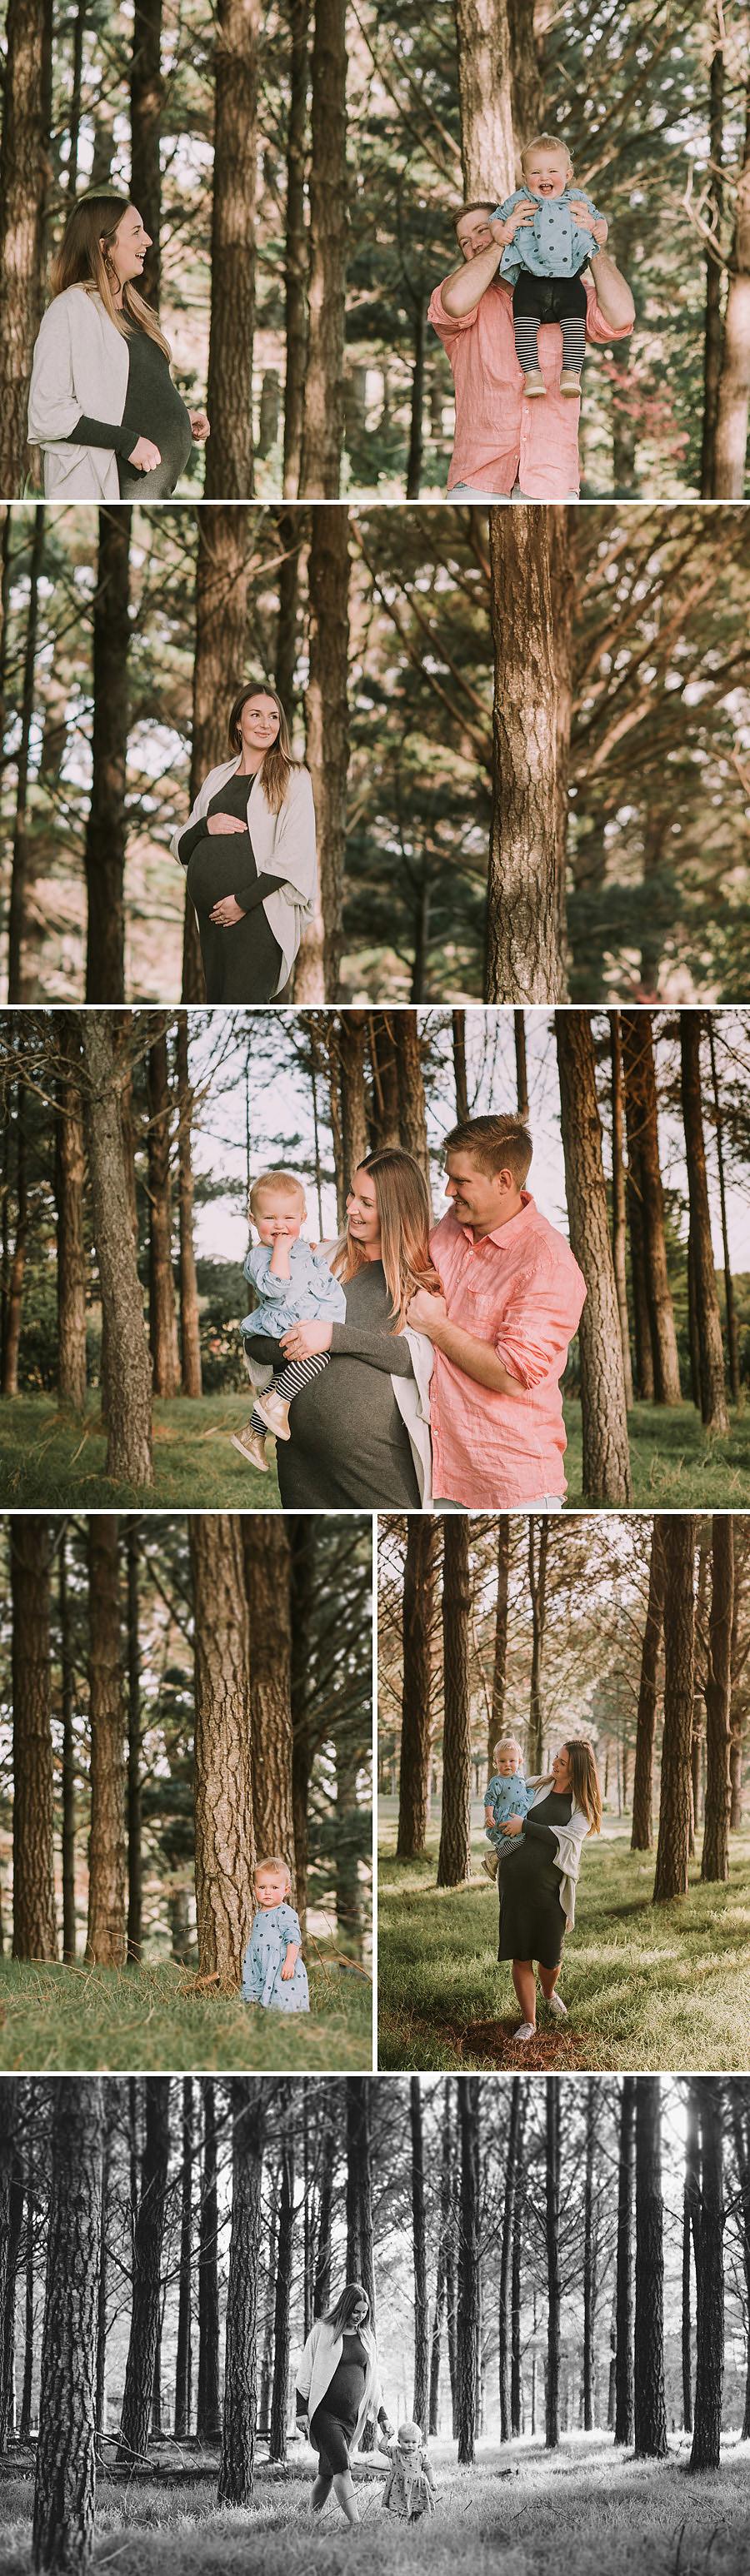 Maternity photographer Jess Burges_Nortland_NewZealand